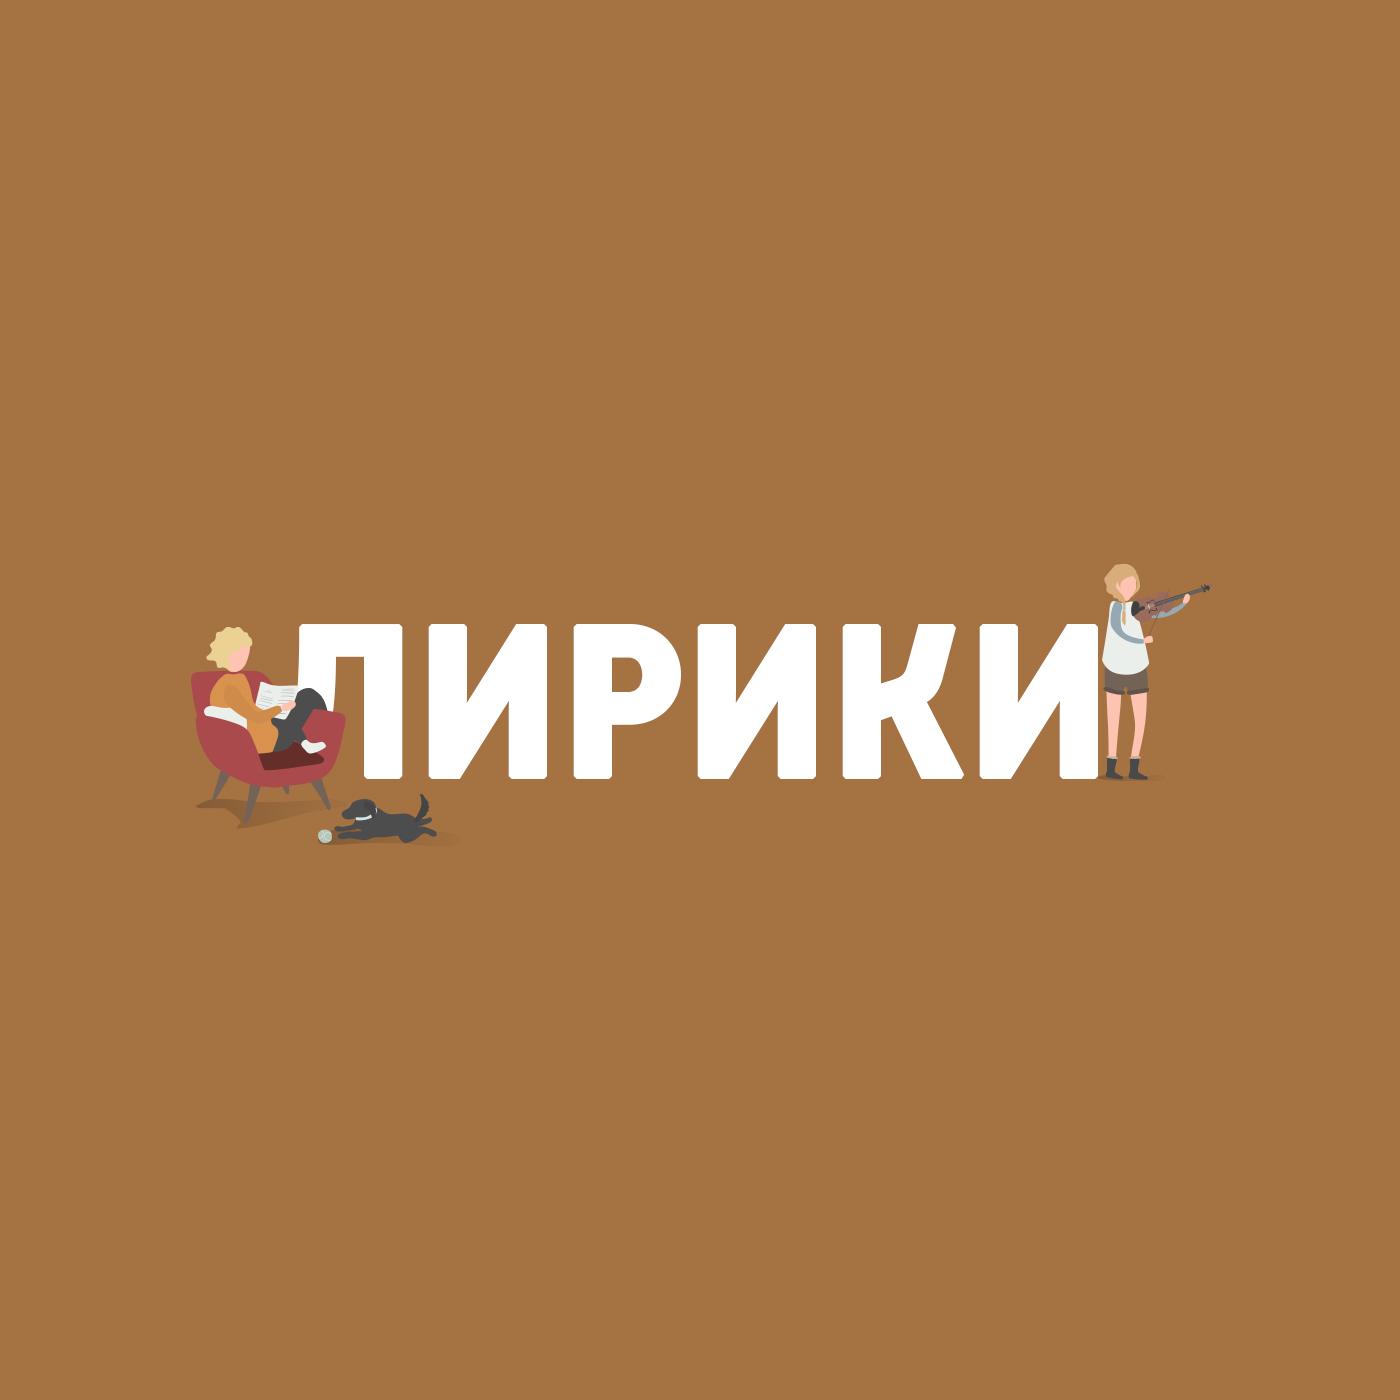 Маргарита Митрофанова Компьютерная лингвистика компьютерная лингвистика